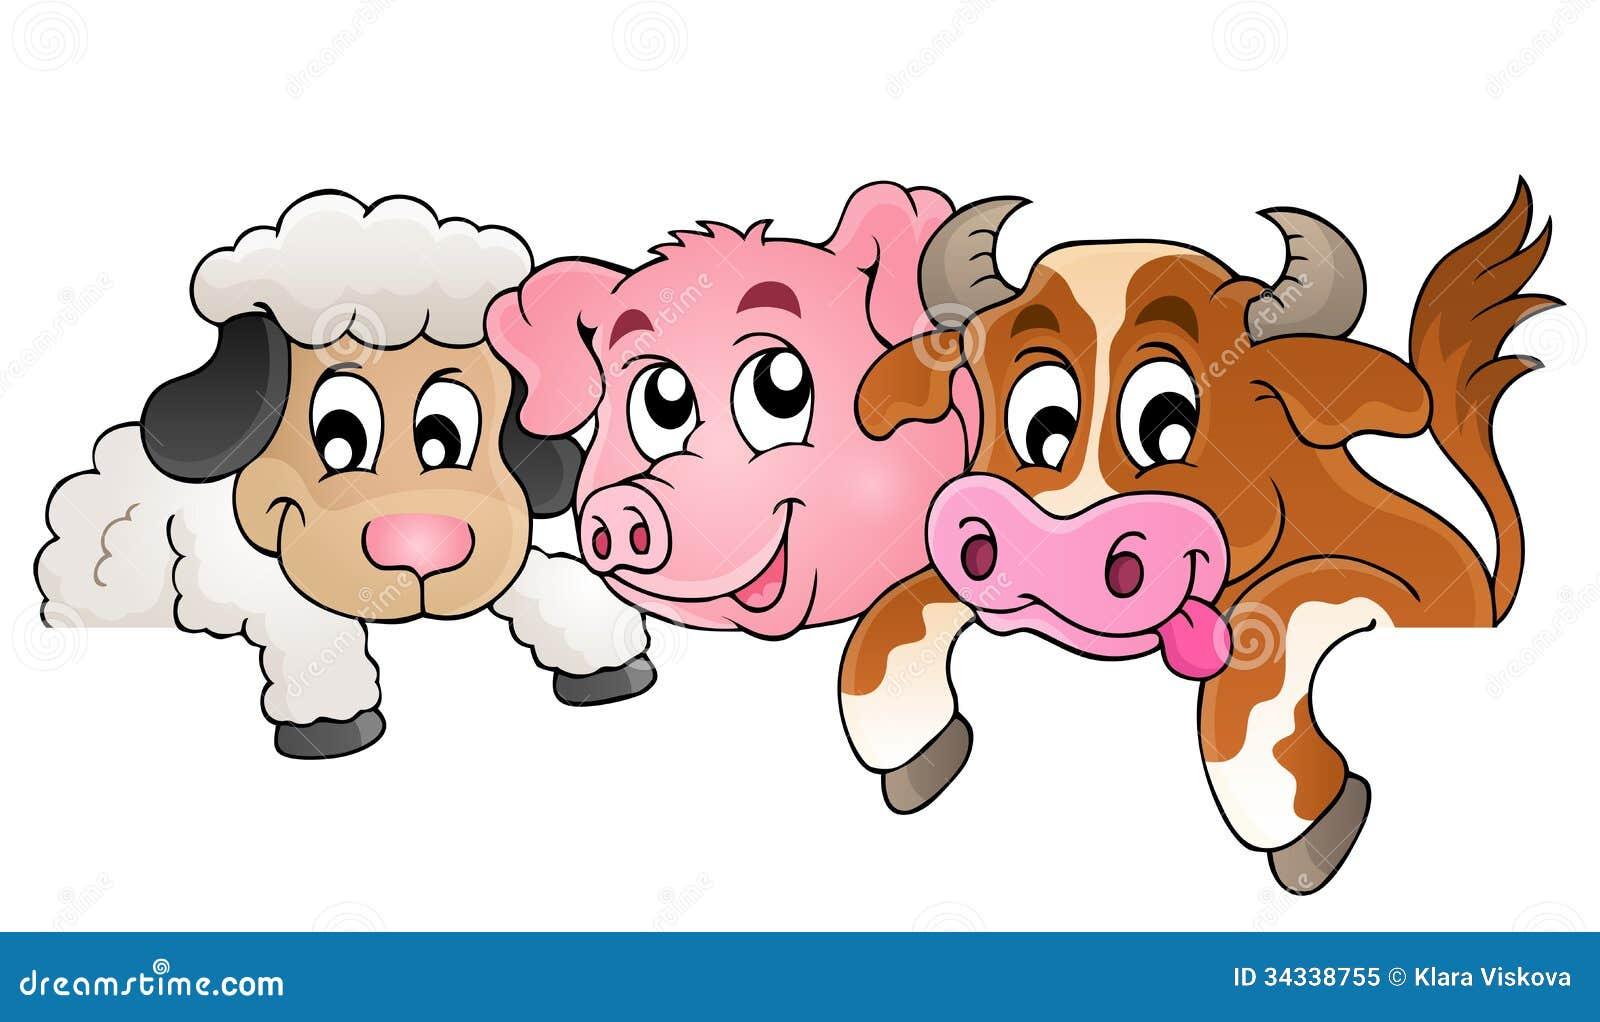 Farm animals topic image 1 - eps10 vector illustration.